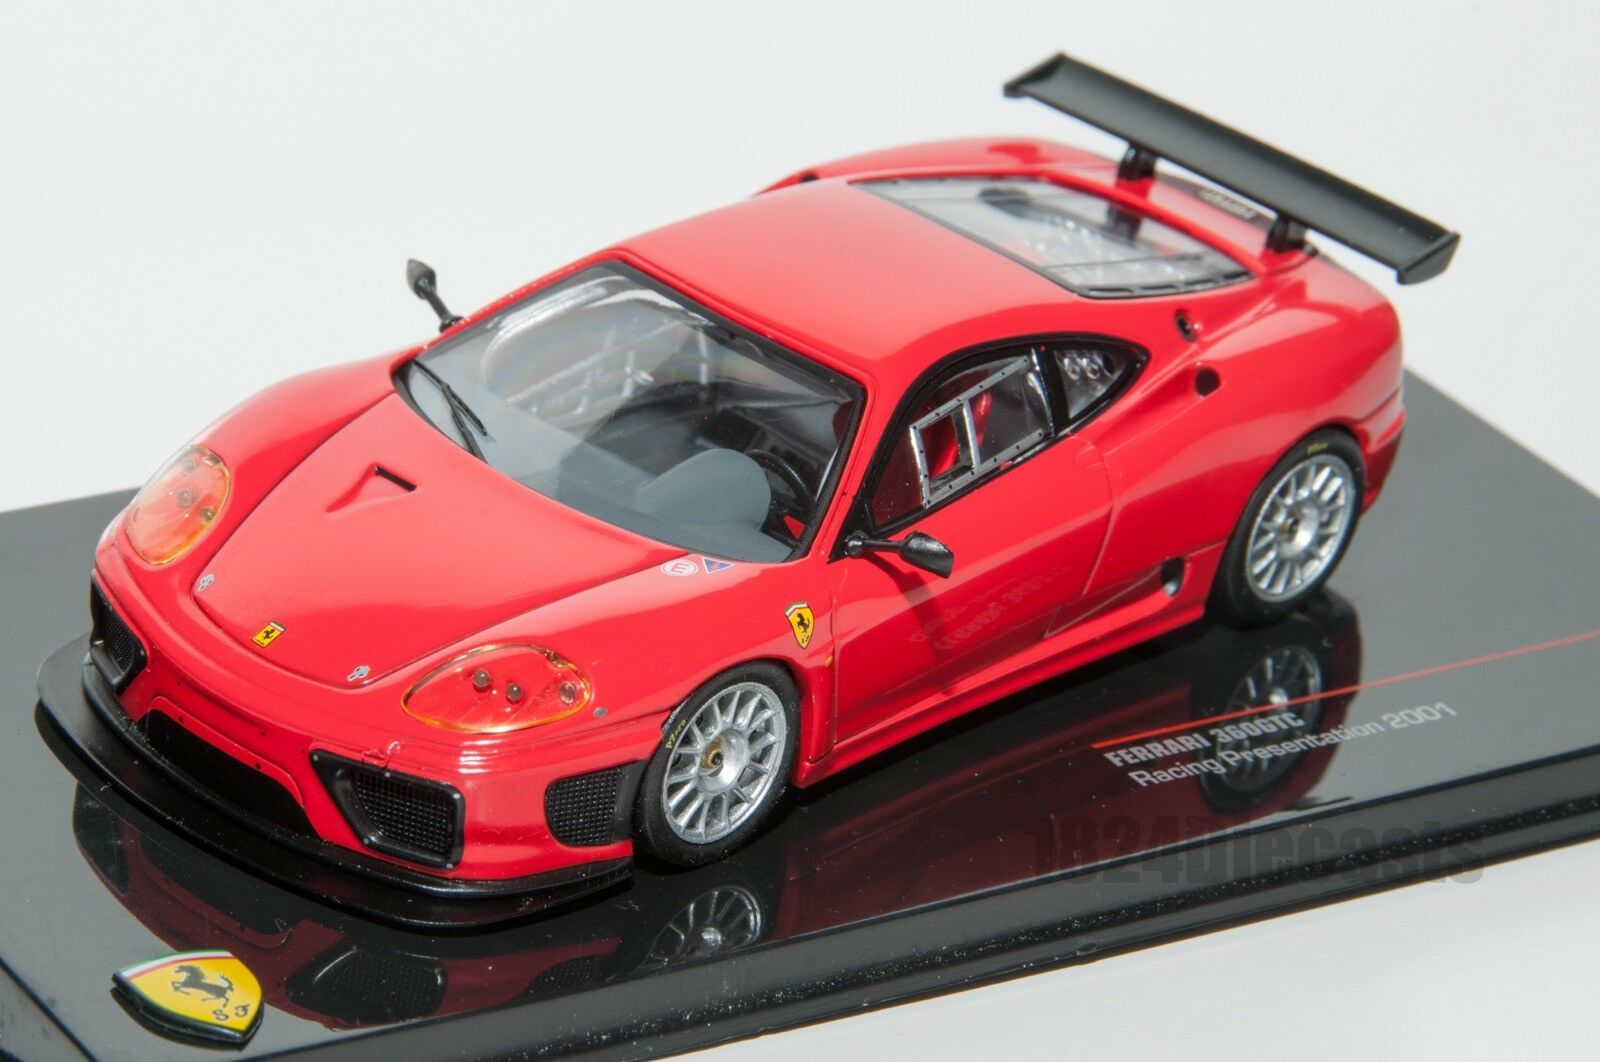 Ferrari 360 GTC Racing red, IXO FER028, scale 1 43, adult car model gift